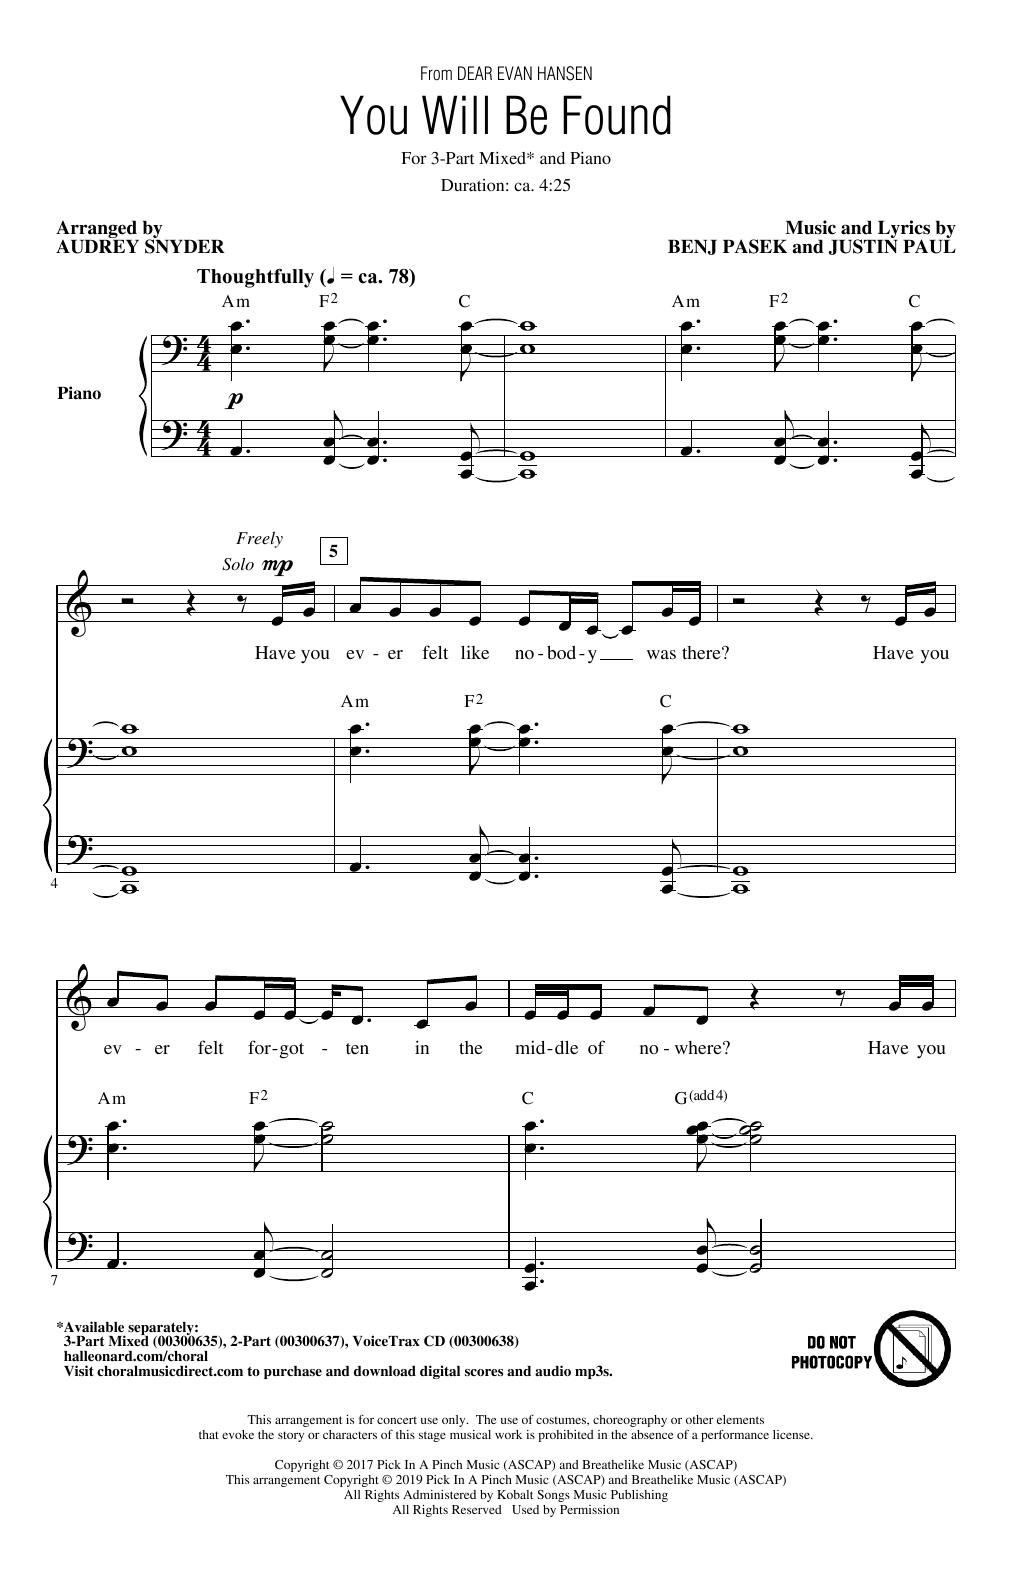 You Will Be Found (from Dear Evan Hansen) (arr. Audrey Snyder) (3-Part Mixed Choir)